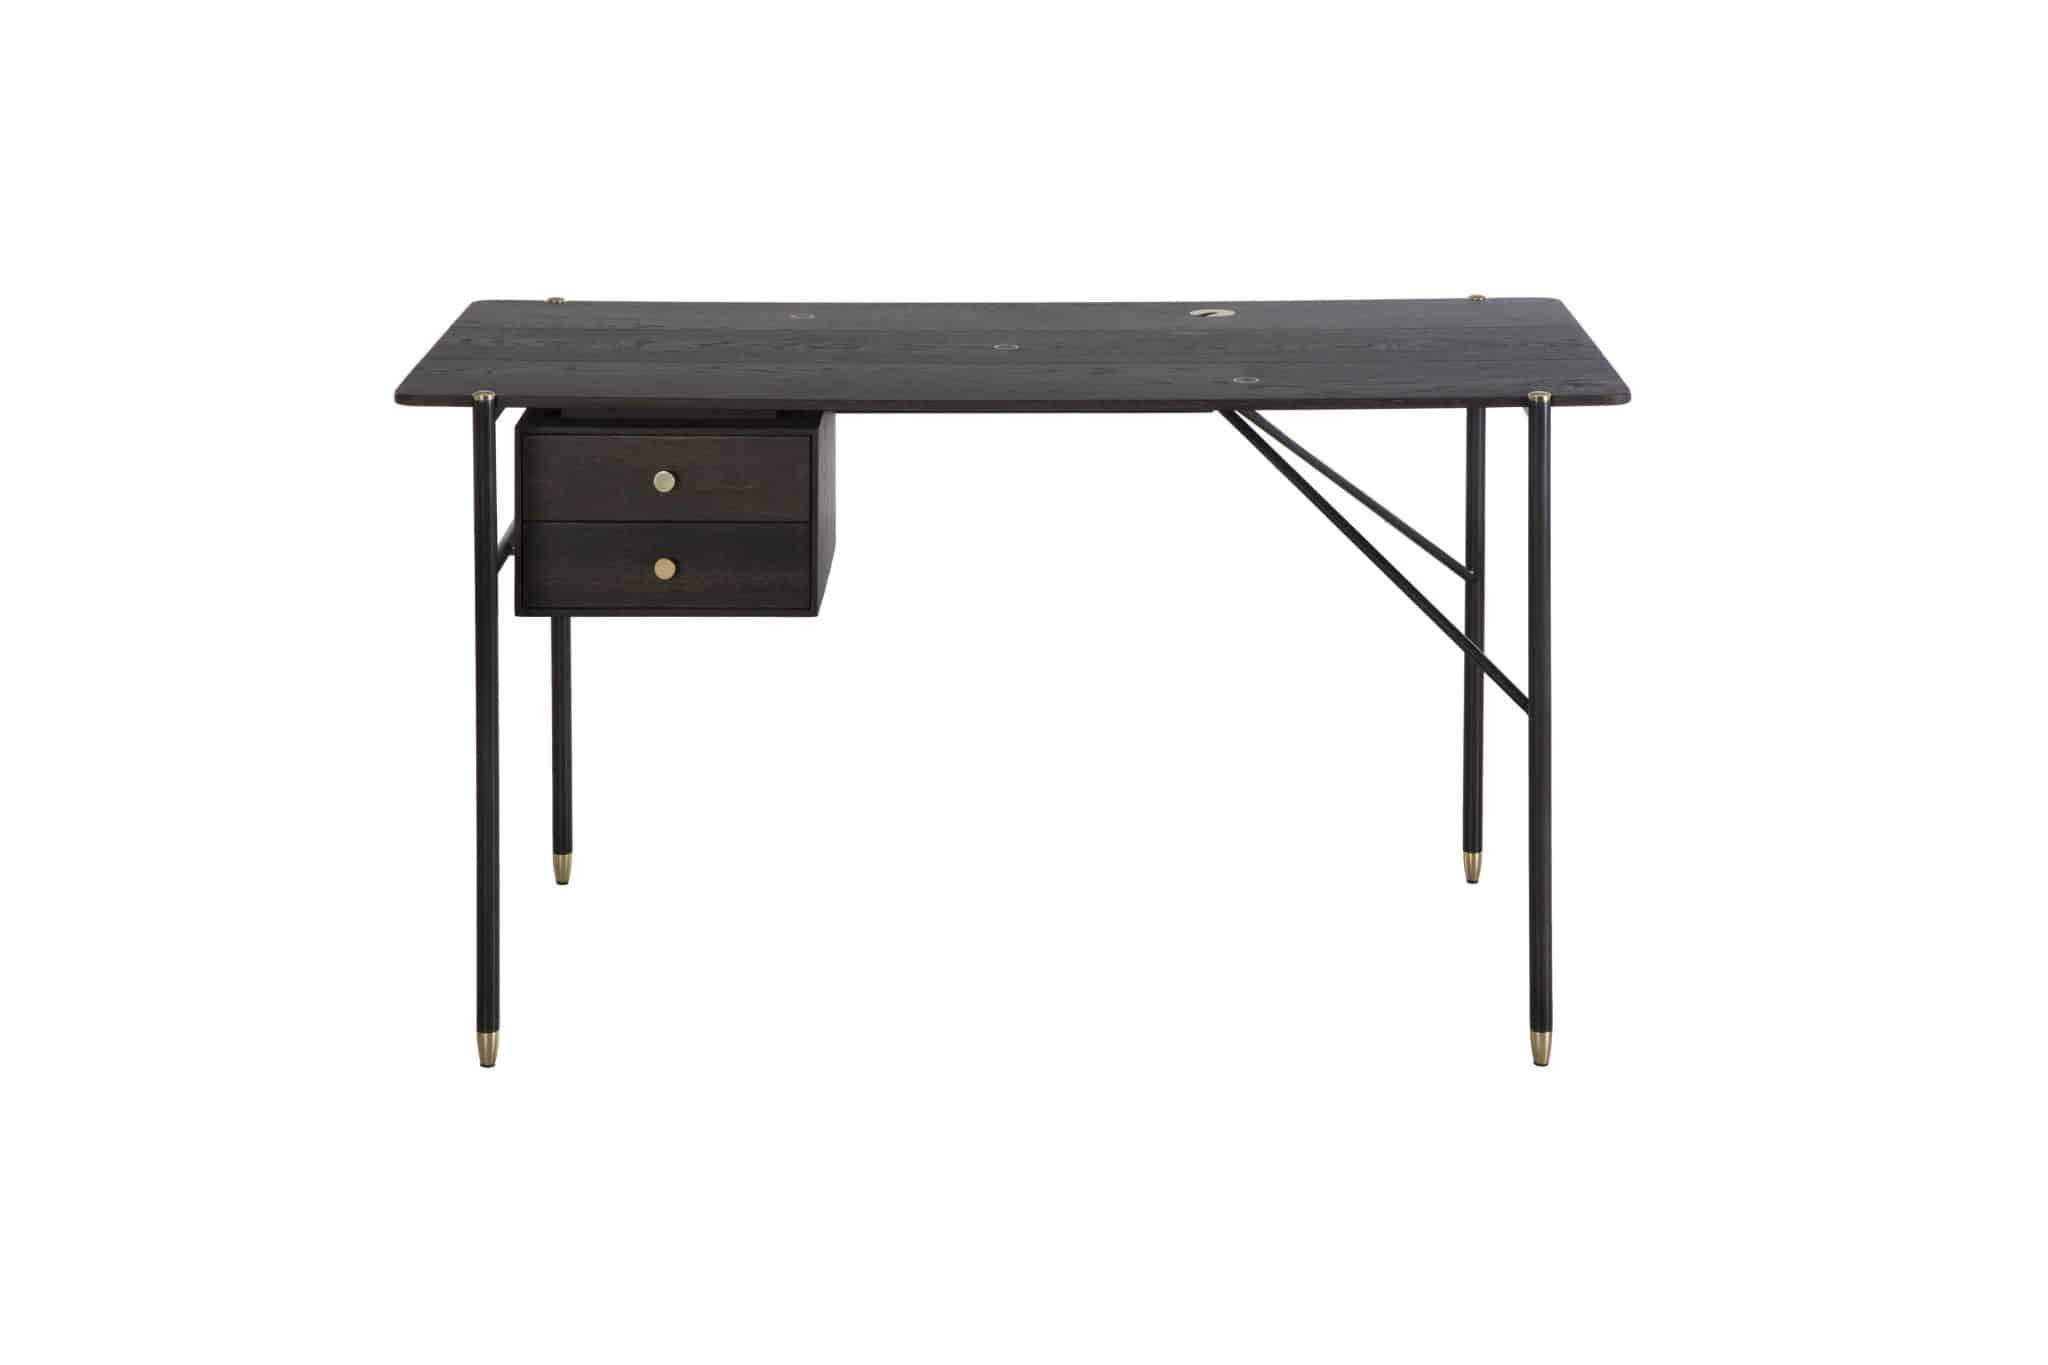 Betchworth Desk